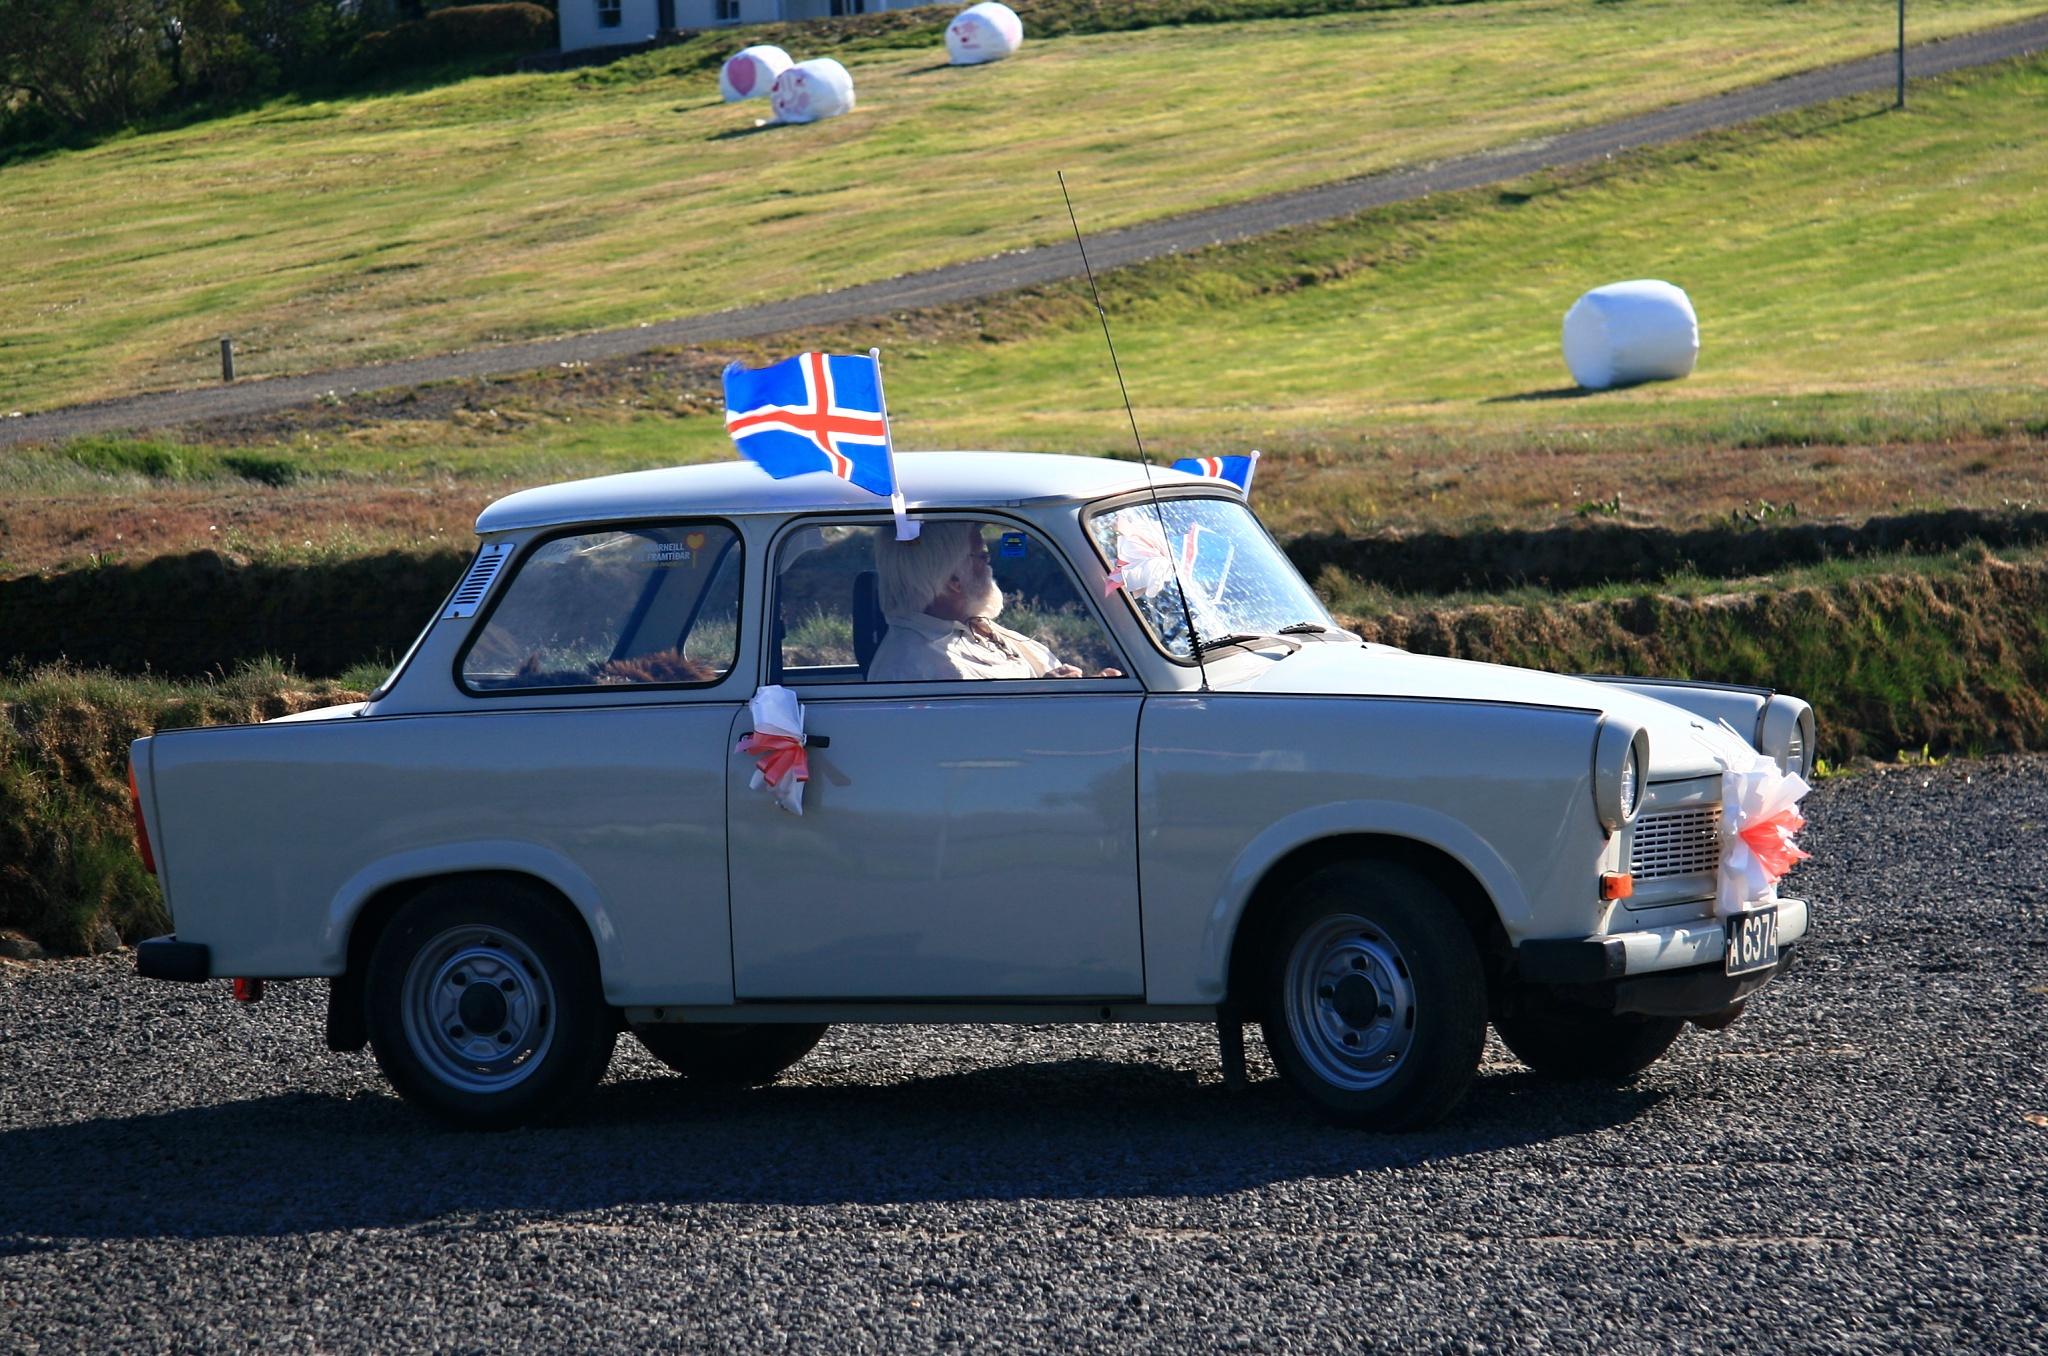 Islandská svatba ve vozu z DDR